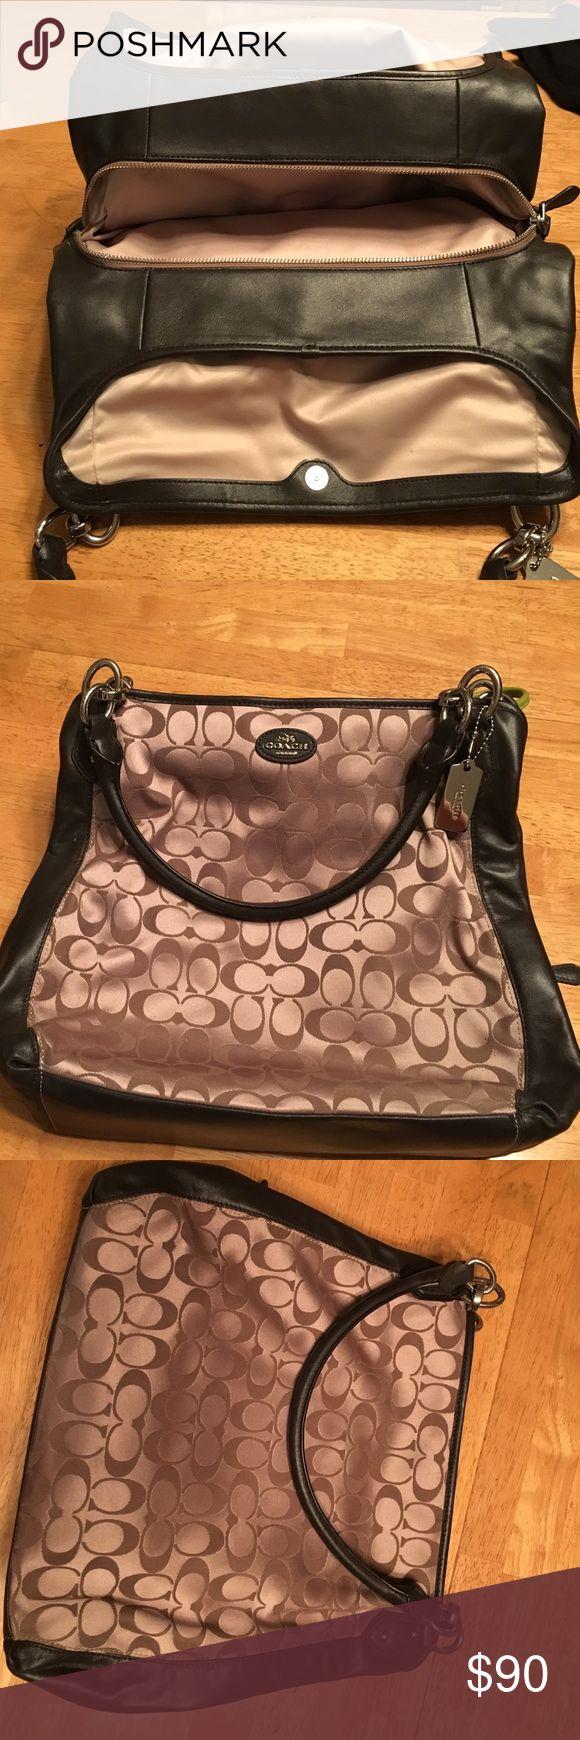 Coach hobo bag Beautiful dark and light brown coach hobo bag. Used once. Coach Bags Hobos